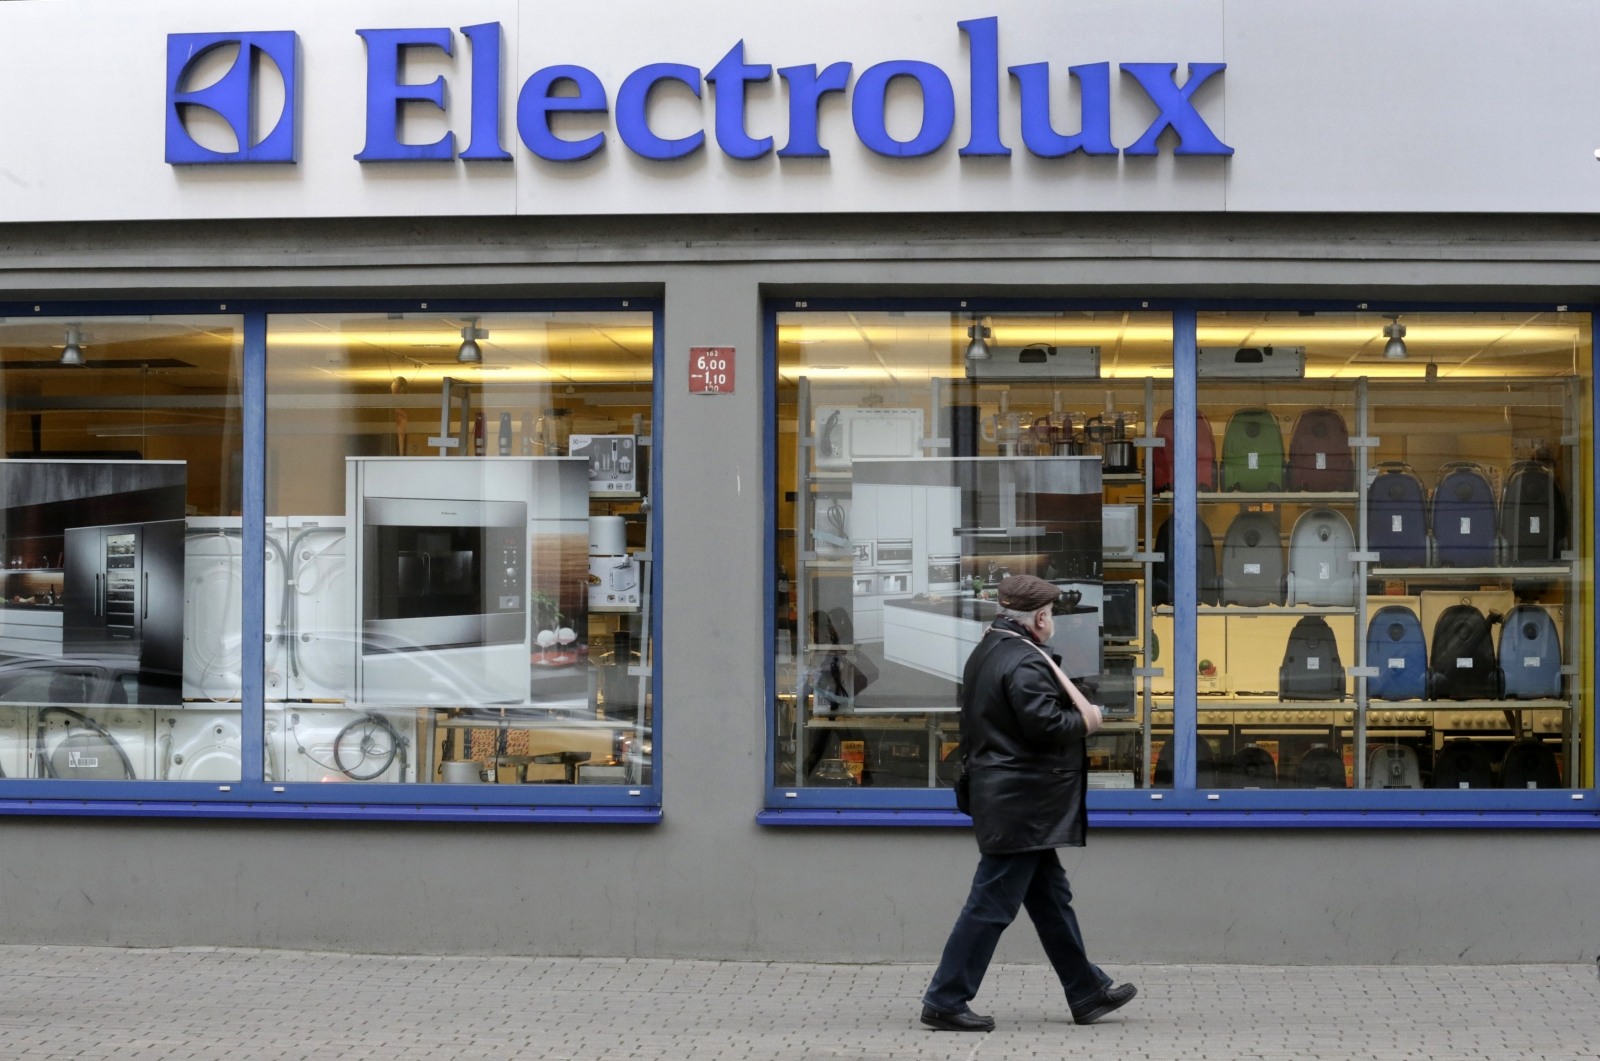 Electrolux shop in Riga